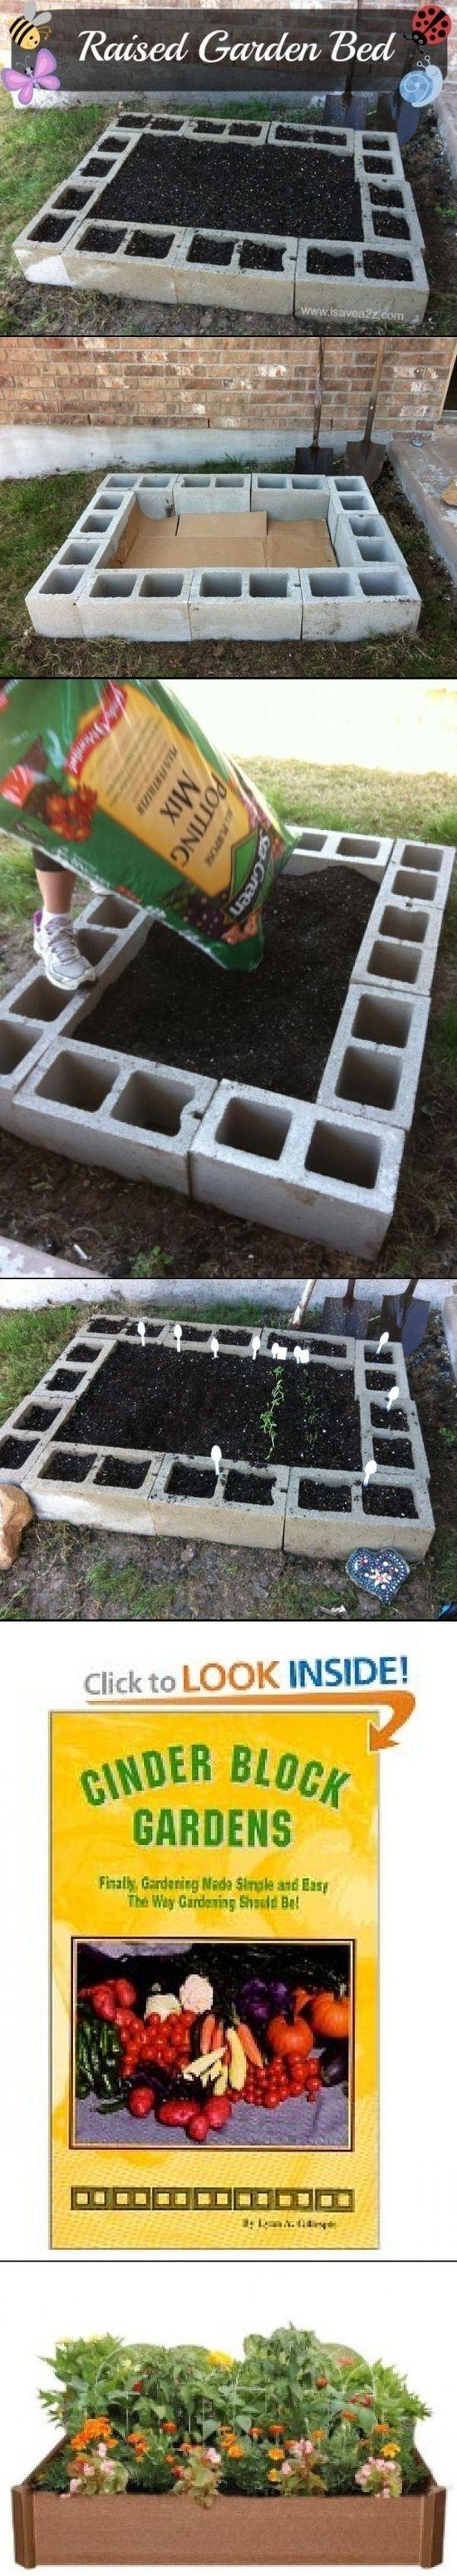 best growing stuff images on pinterest raised gardens